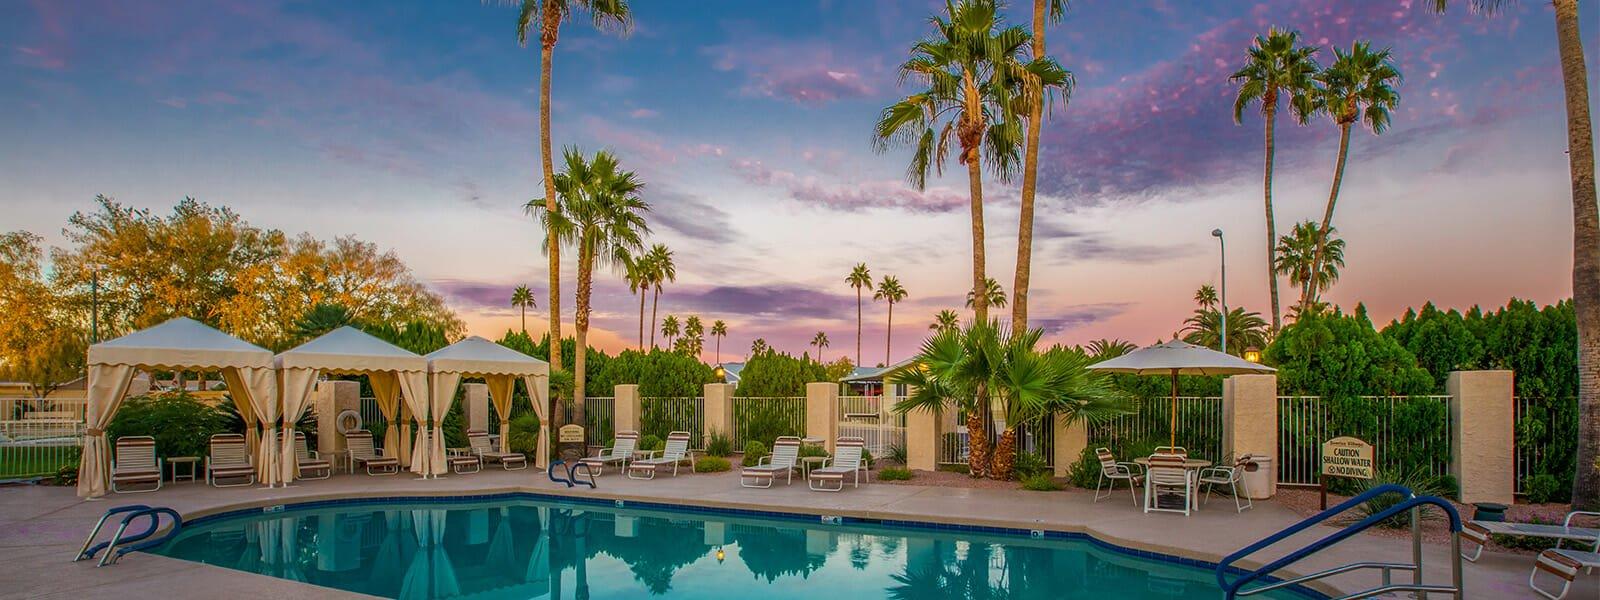 Sunrise Village Active Adult 55+ Community near Phoenix AZ